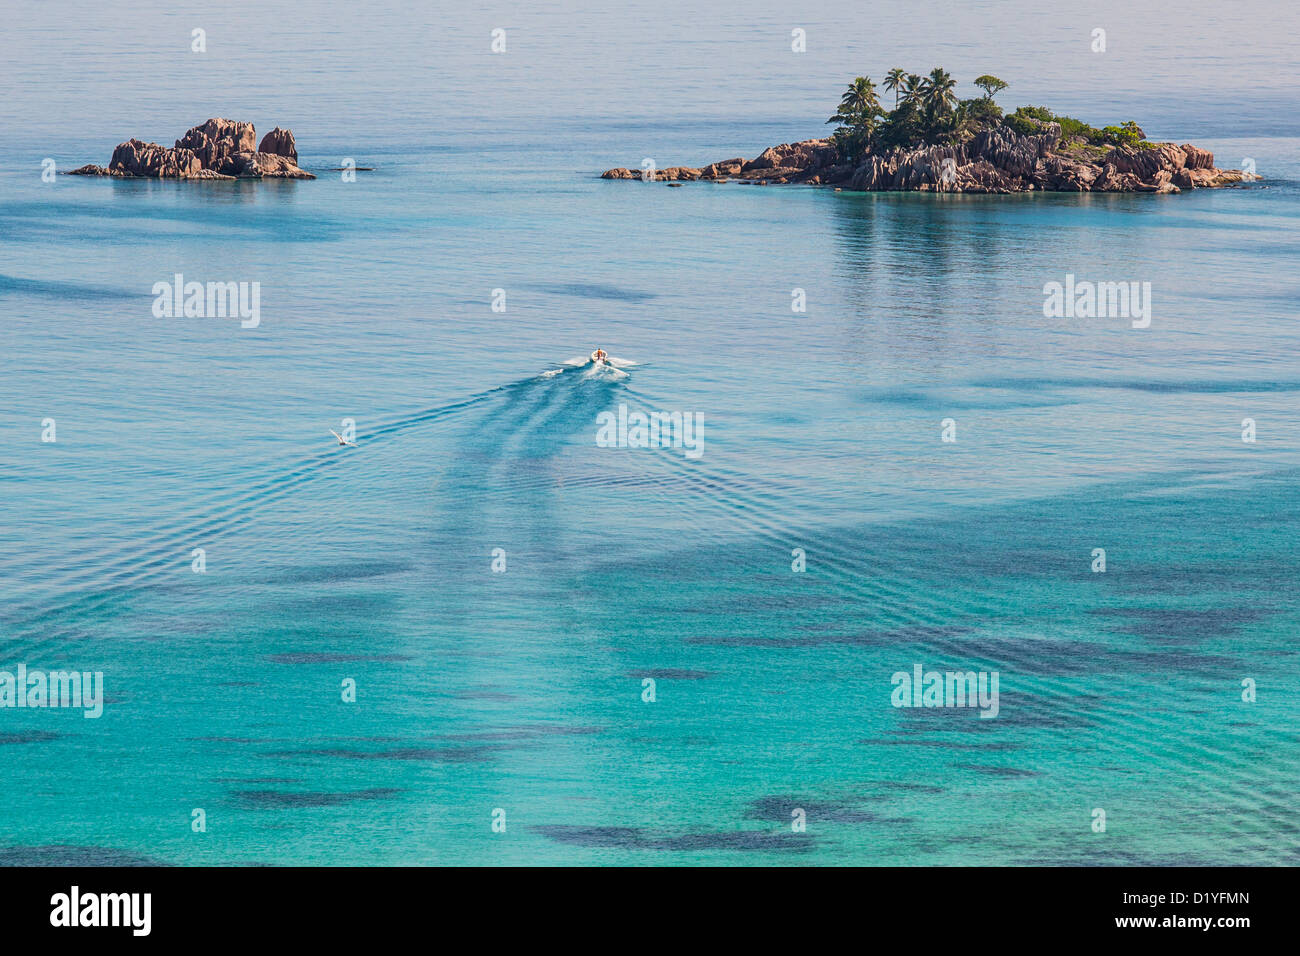 St Pierre Island, Praslin, Seychelles - Stock Image